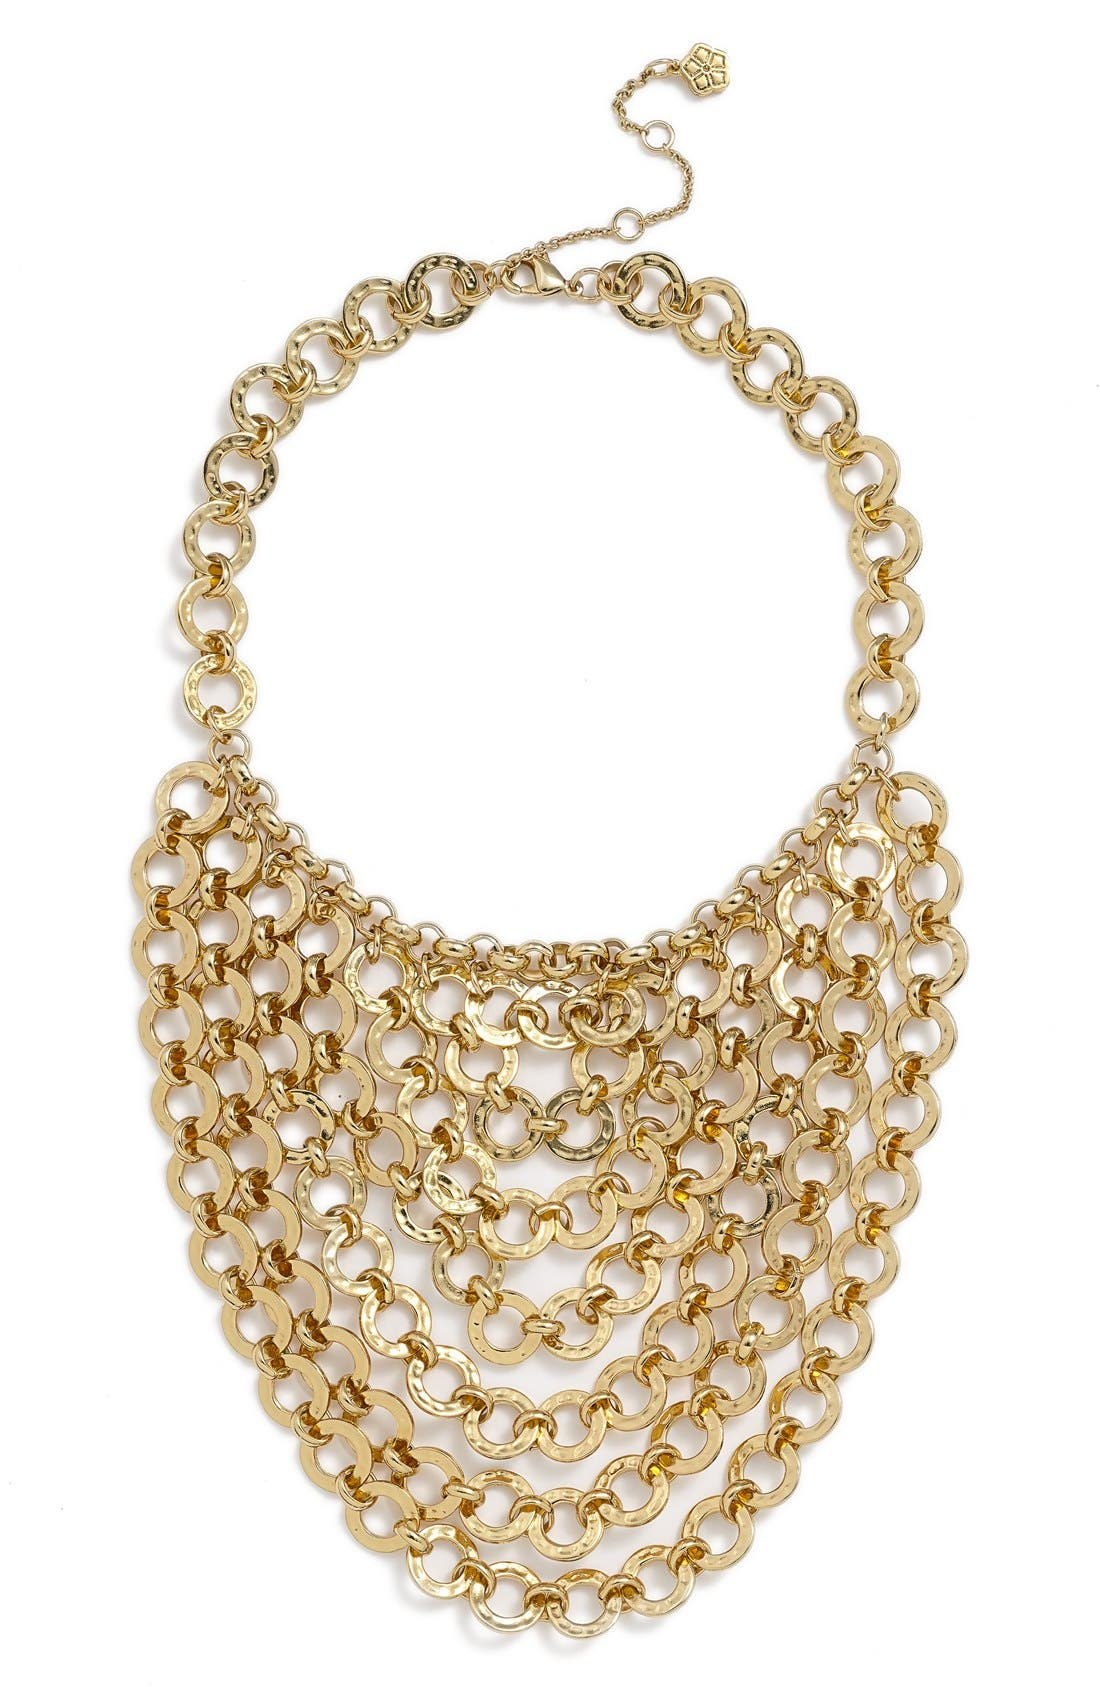 Main Image - Trina Turk Chain Bib Necklace